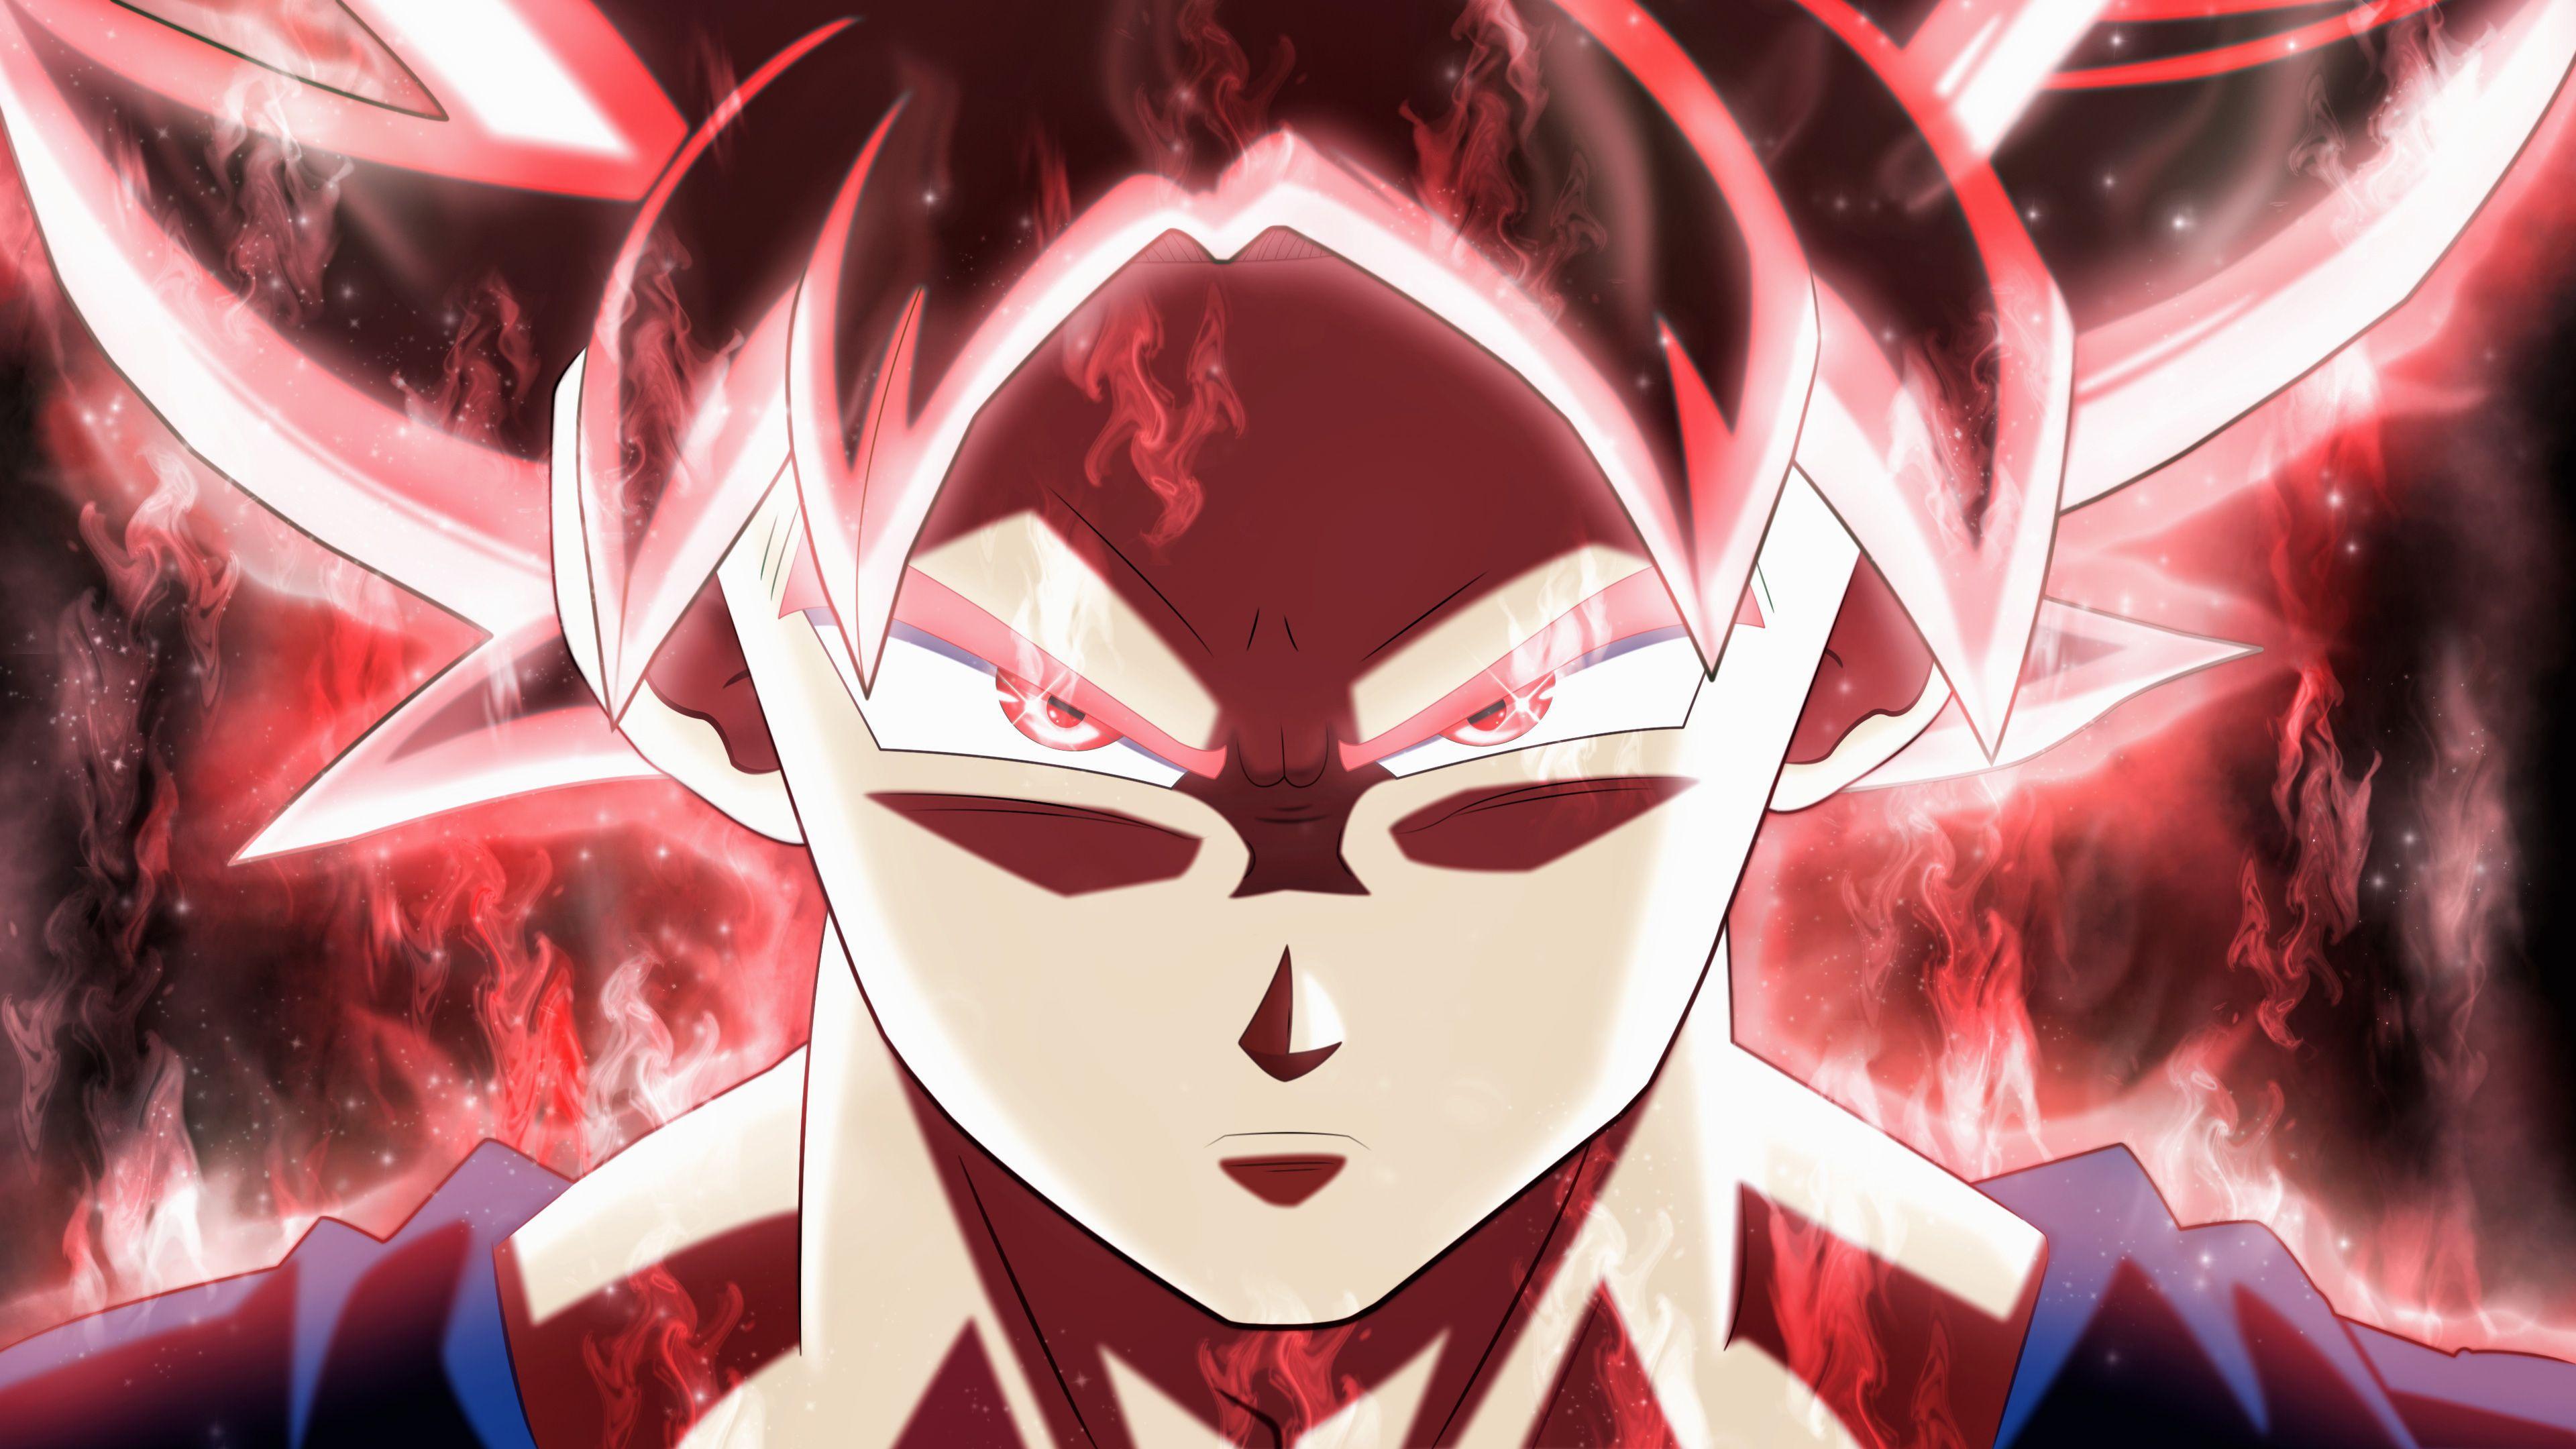 Red Goku Wallpaper 4k